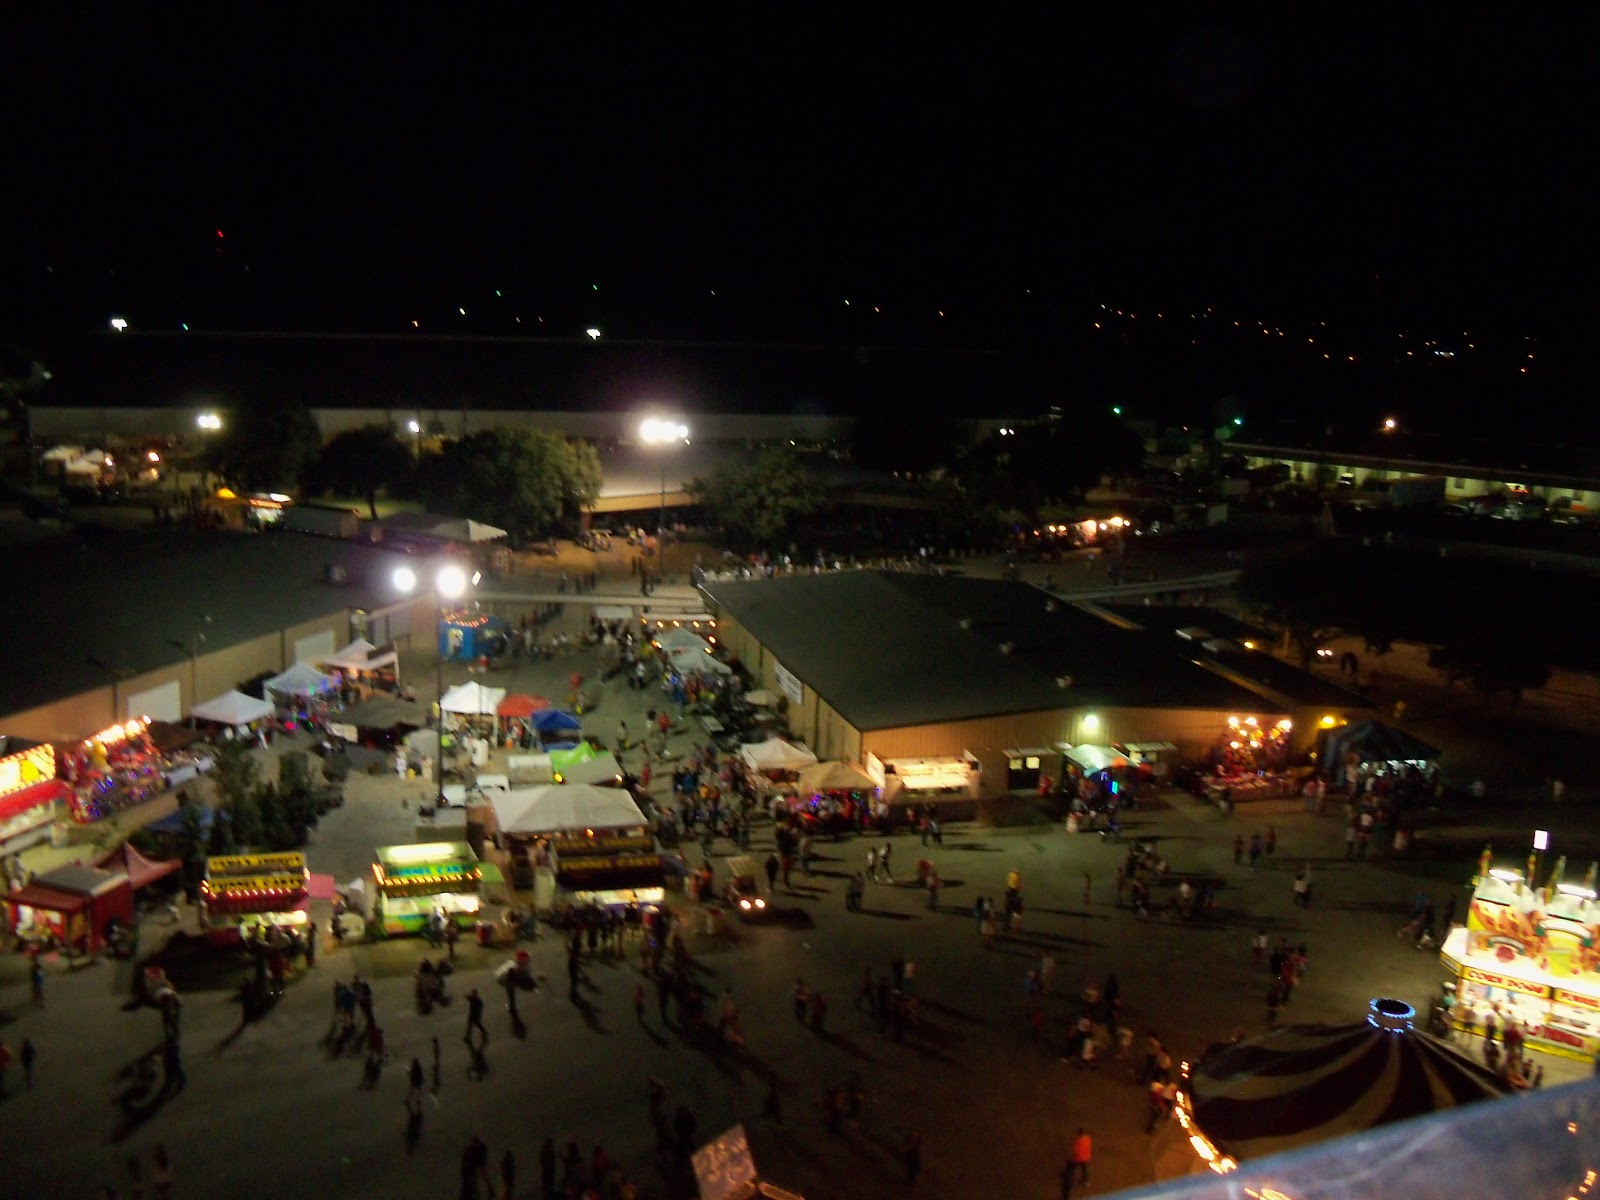 Fort Bend County Fair 2010 - 101_6048.JPG